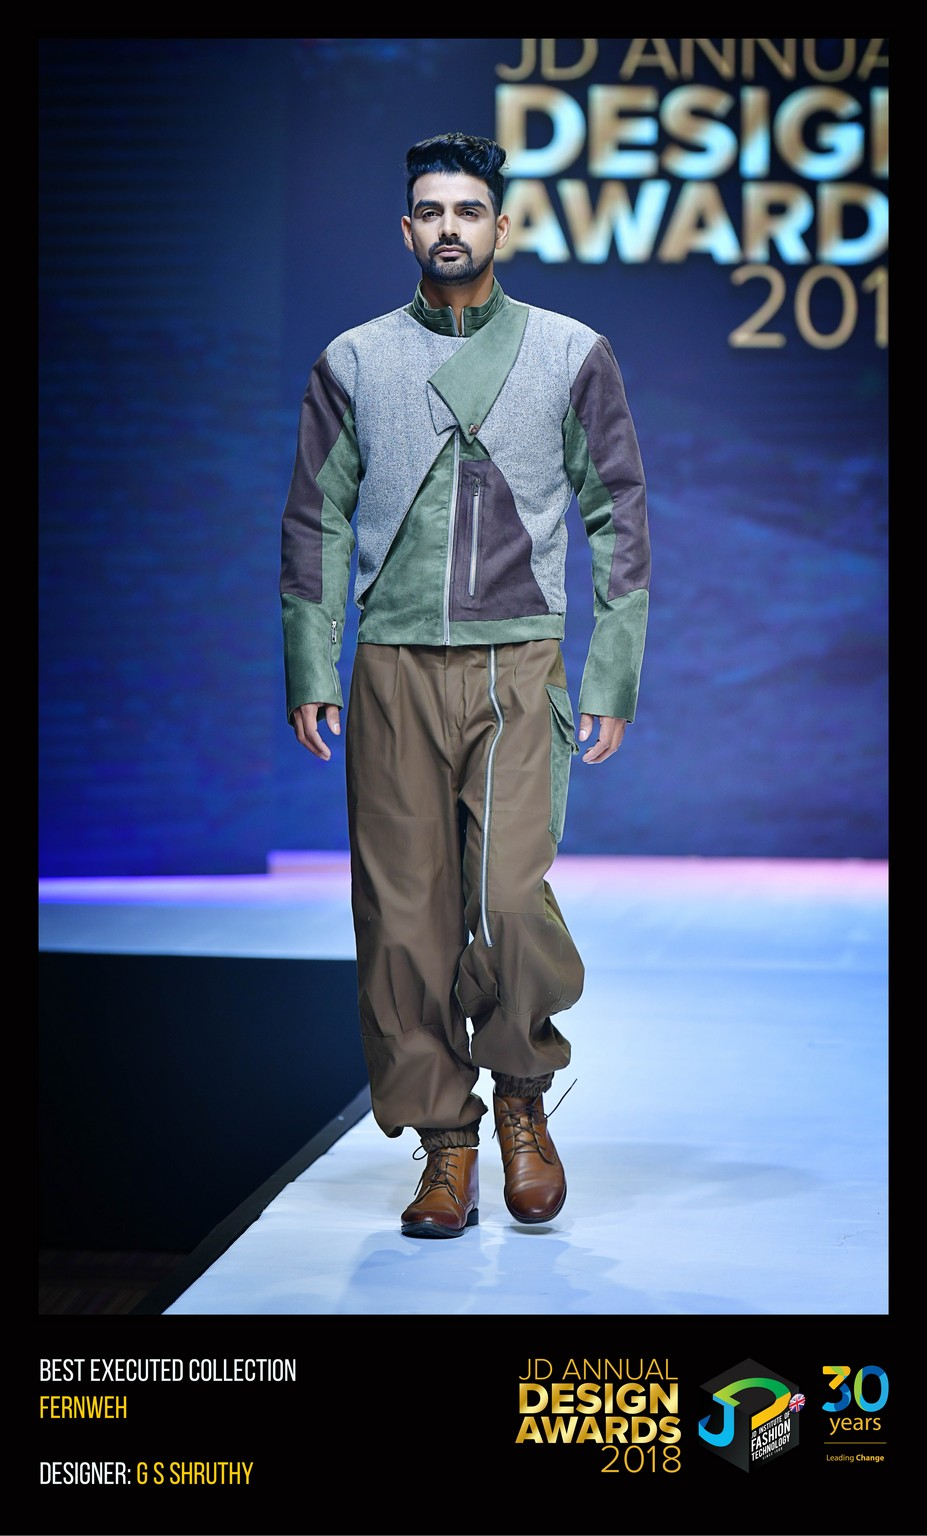 Fernweh – Change – JD Annual Design Awards 2018 | Designer: G.S Shruthi (ADFD 2015 Batch) | Photography : Jerin Nath (@jerin_nath) fernweh Fernweh – Change – JD Annual Design Awards 2018 FERNWEH2